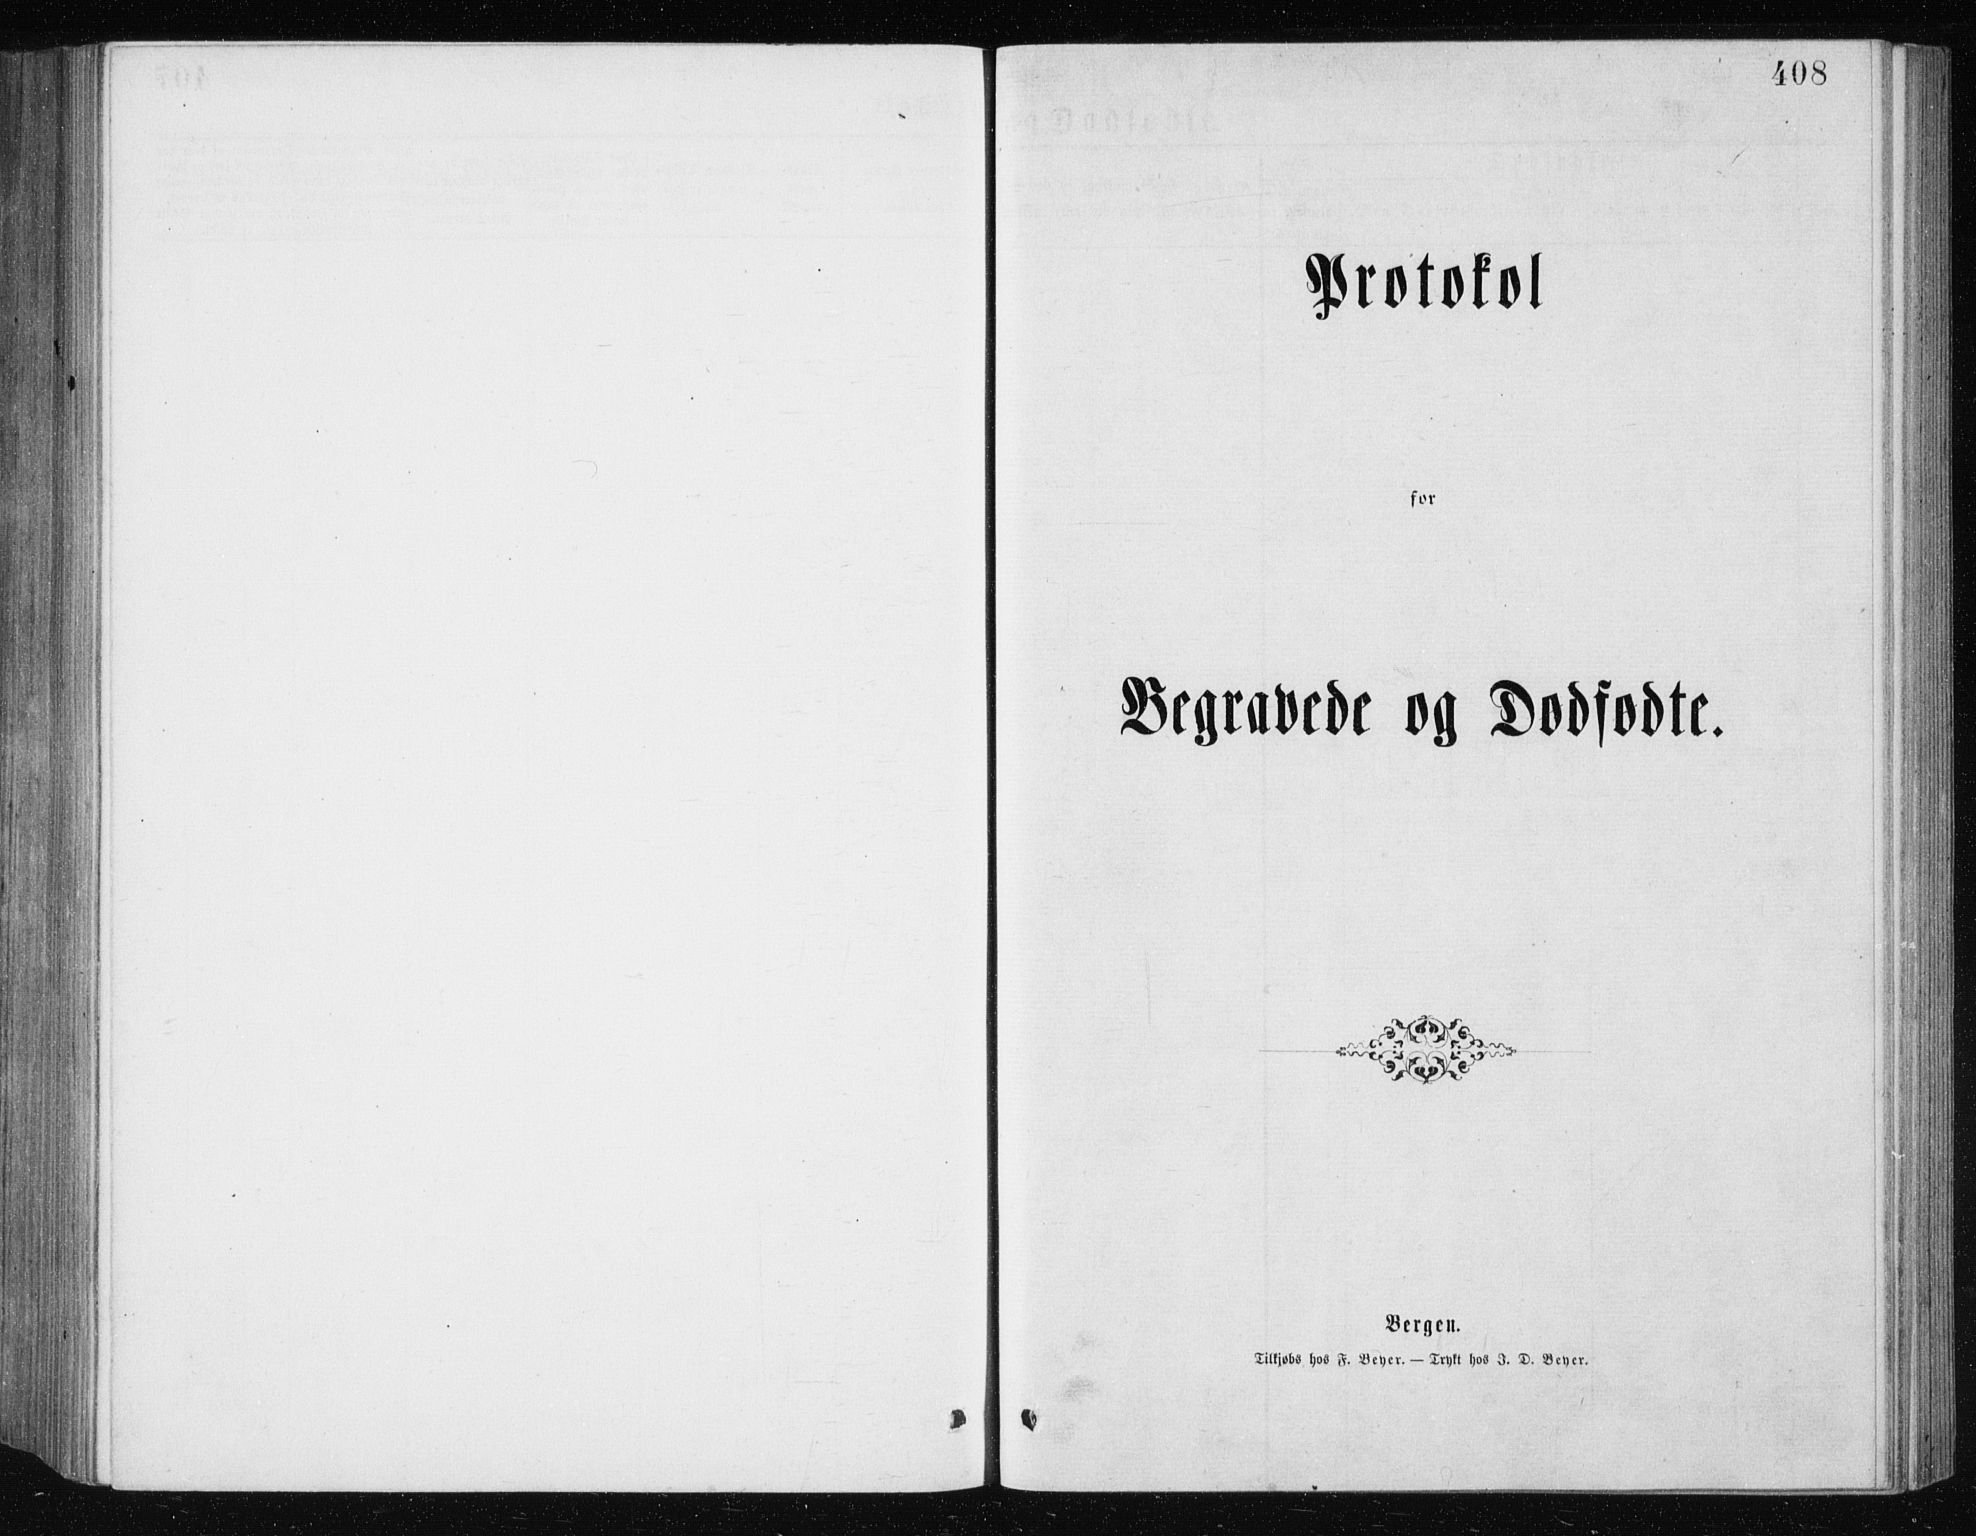 SAT, Ministerialprotokoller, klokkerbøker og fødselsregistre - Nordland, 801/L0031: Klokkerbok nr. 801C06, 1883-1887, s. 408